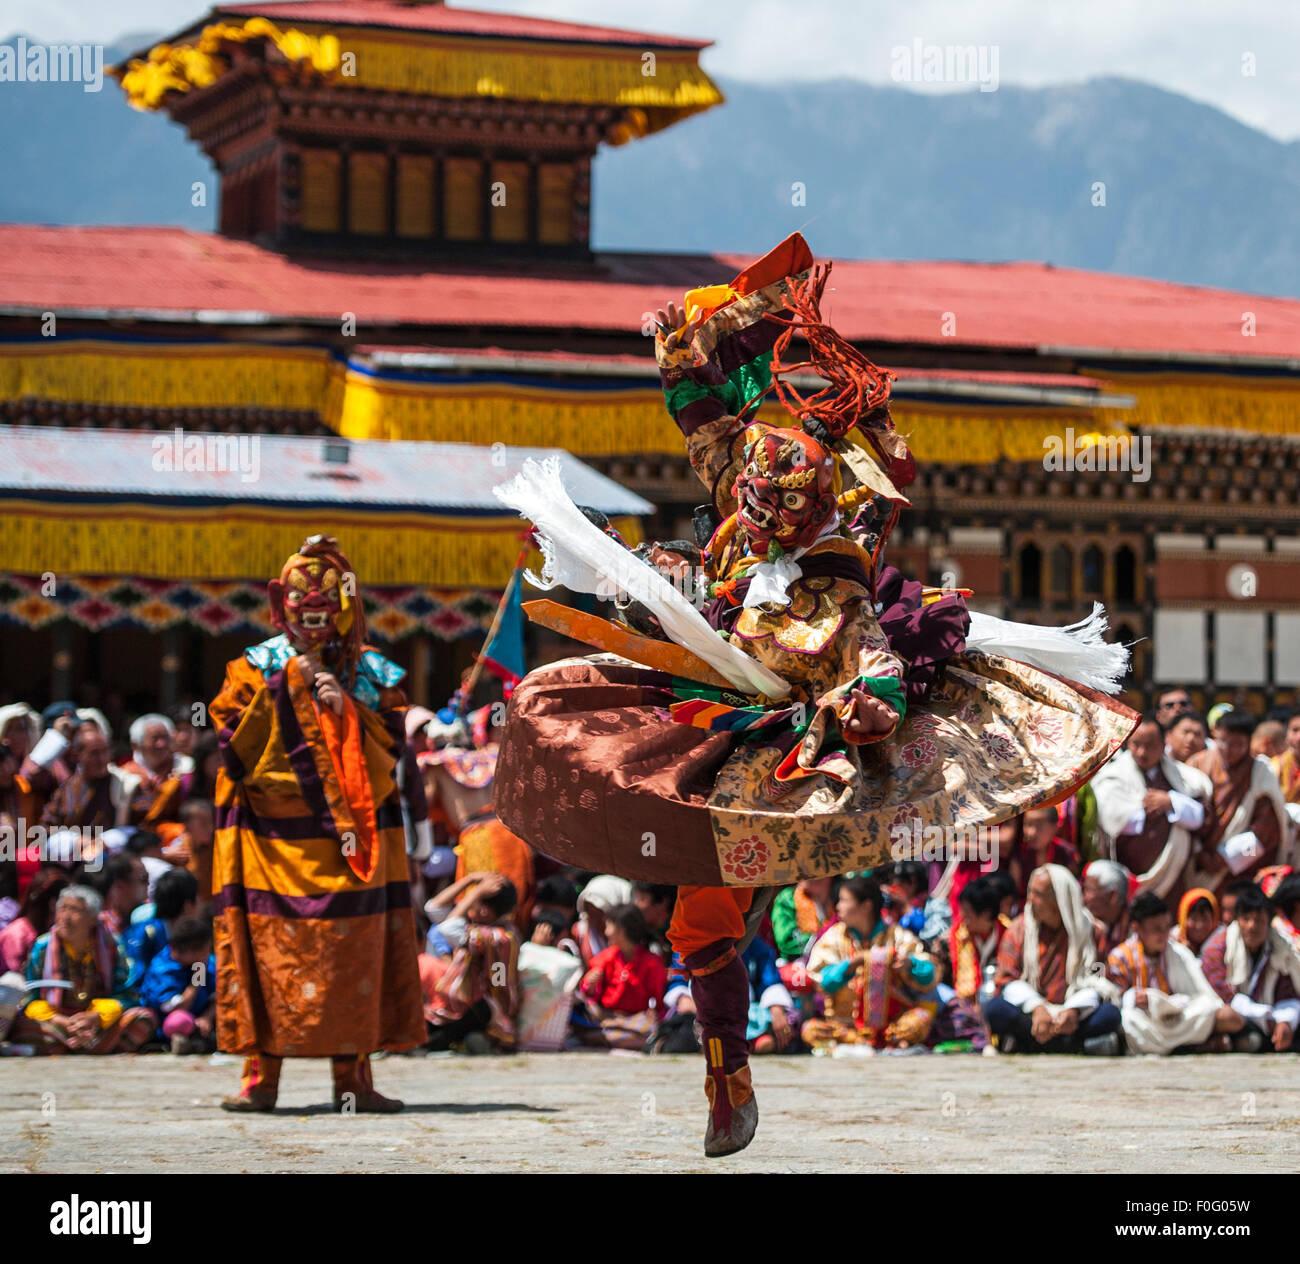 Dance of terrifying deities (Tungam) with spectators in the background Paro religious festival Bhutan - Stock Image